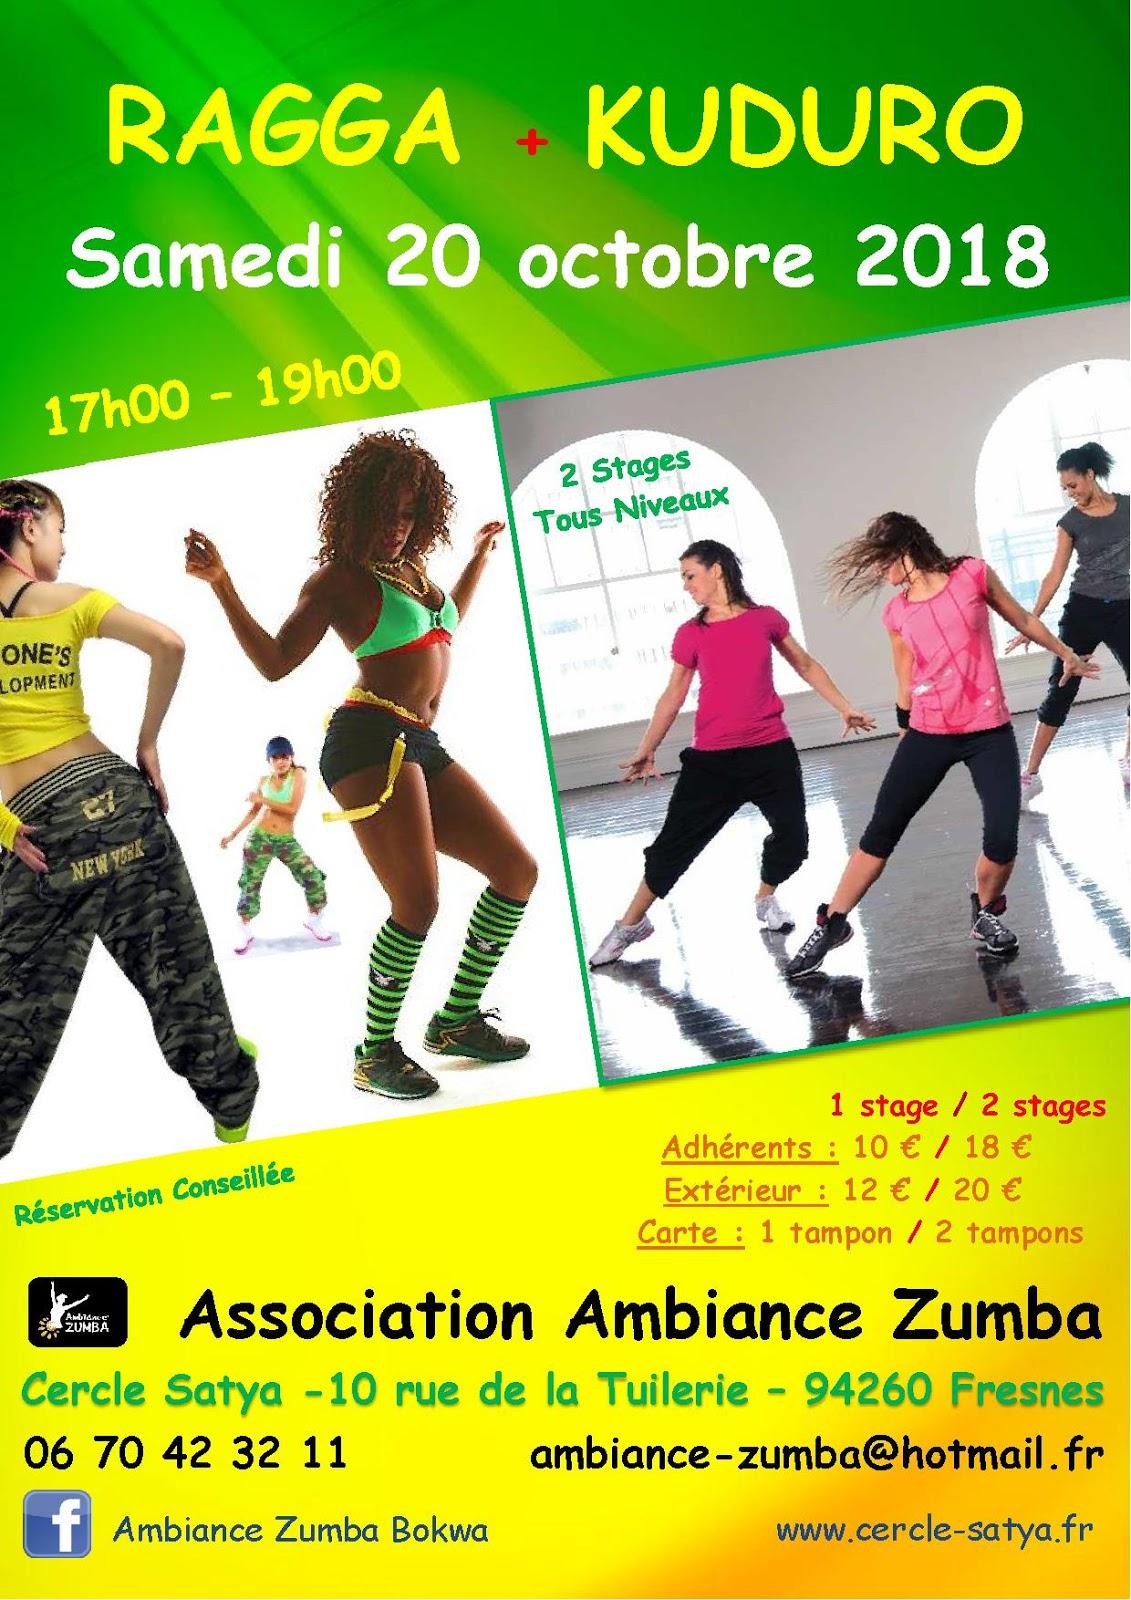 Danse En Ligne Kuduro : danse, ligne, kuduro, Cercle, Satya:, RAGGA, DANCEHALL, KUDURO, (Samedi, Octobre, 17h-19h)